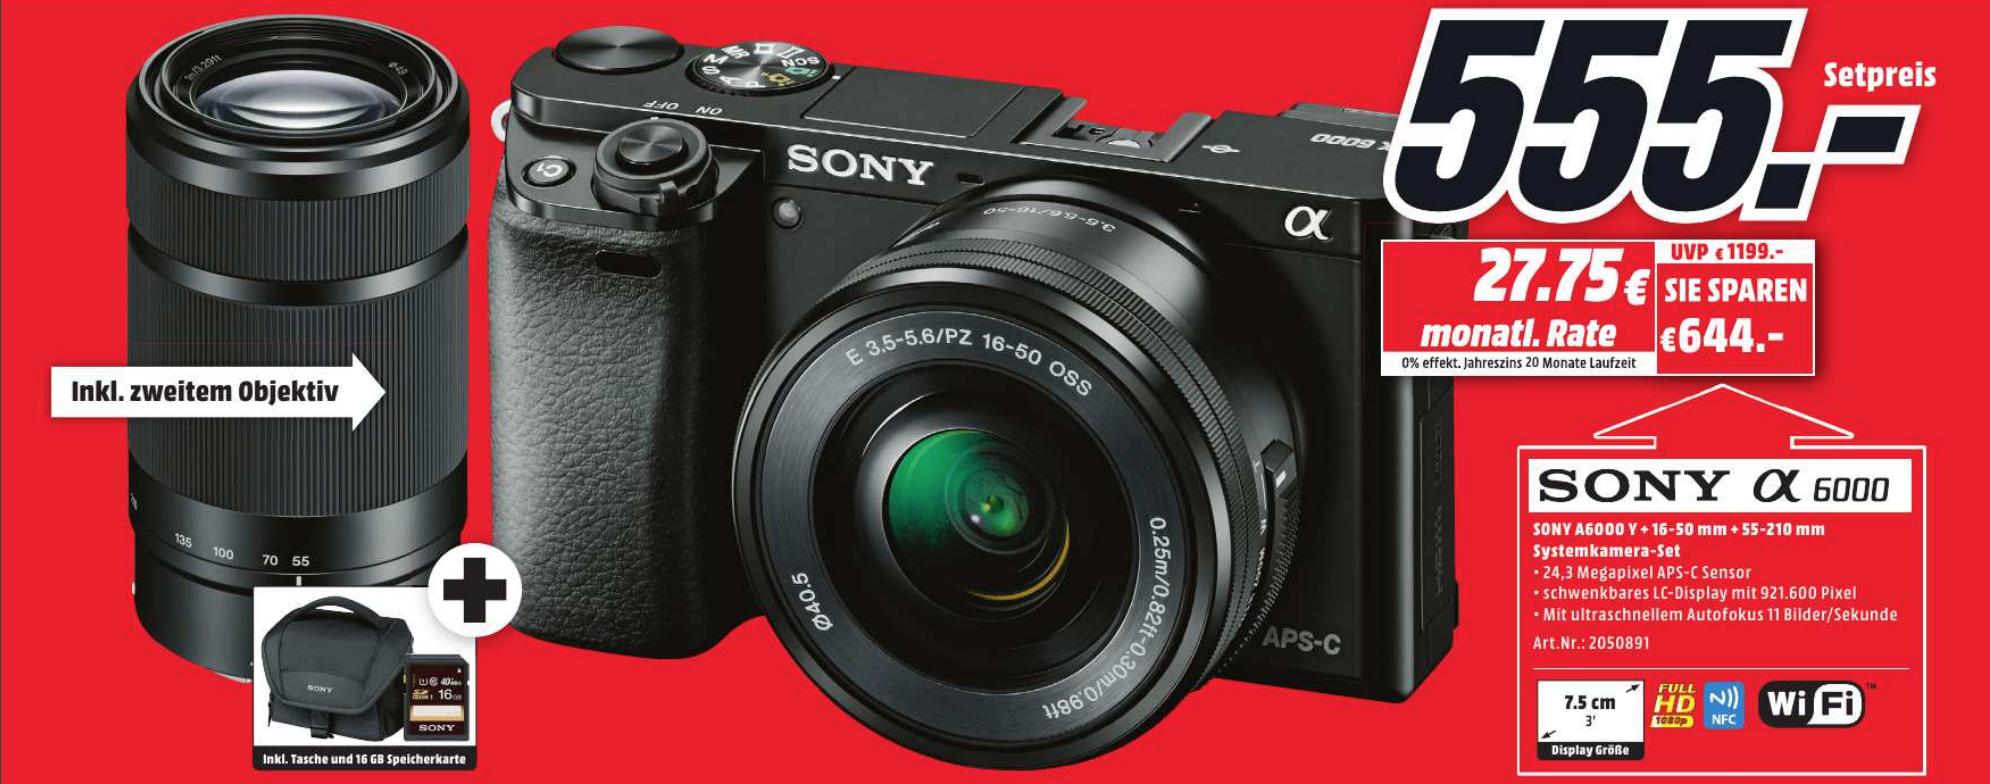 [Lokal Potsdam Mediamarkt Neueröffnung] Sony Alpha 6000 A6000 im Doppelzoomkit